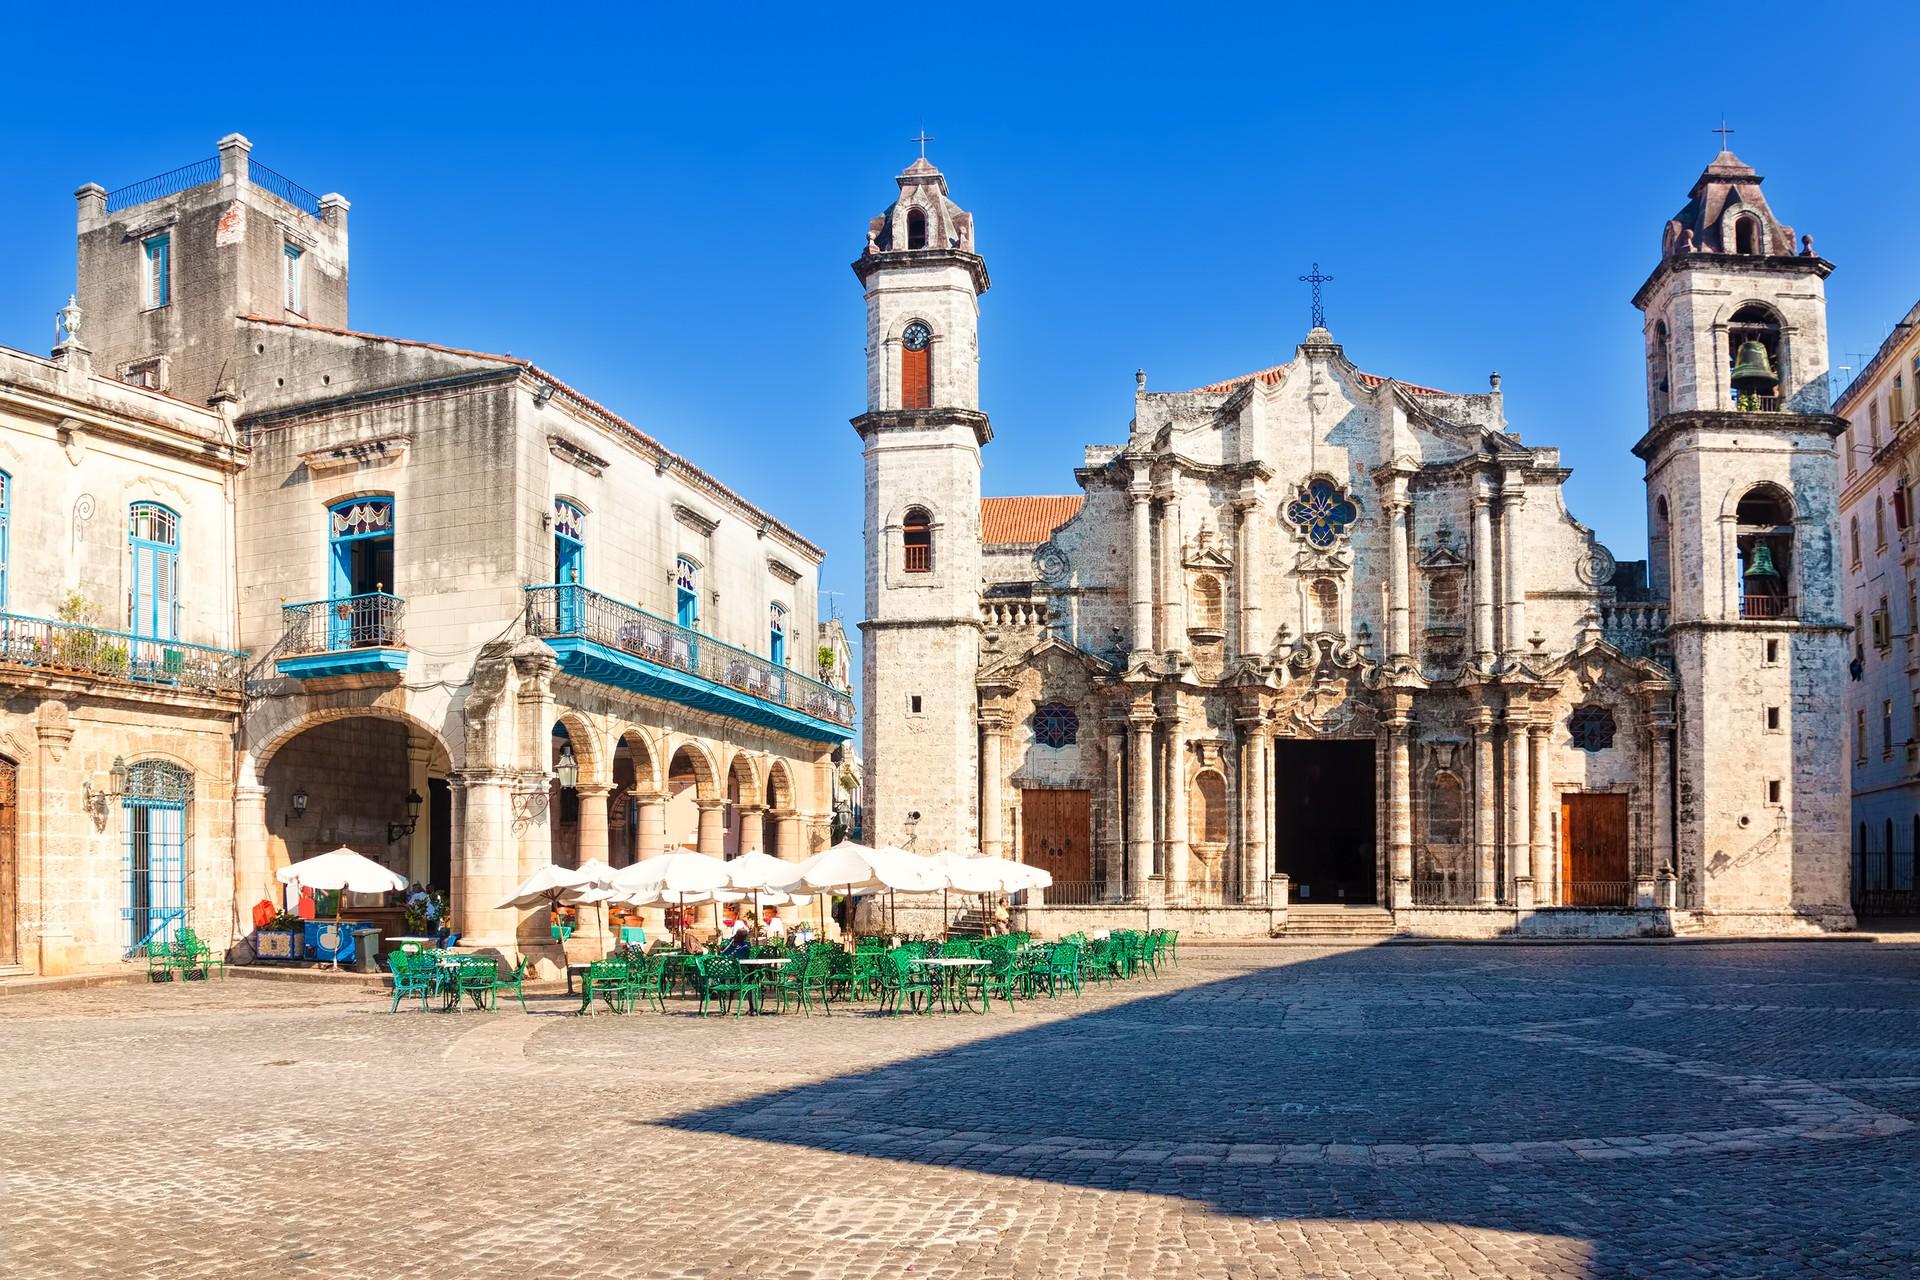 The Catedral de San Cristobal in Havana